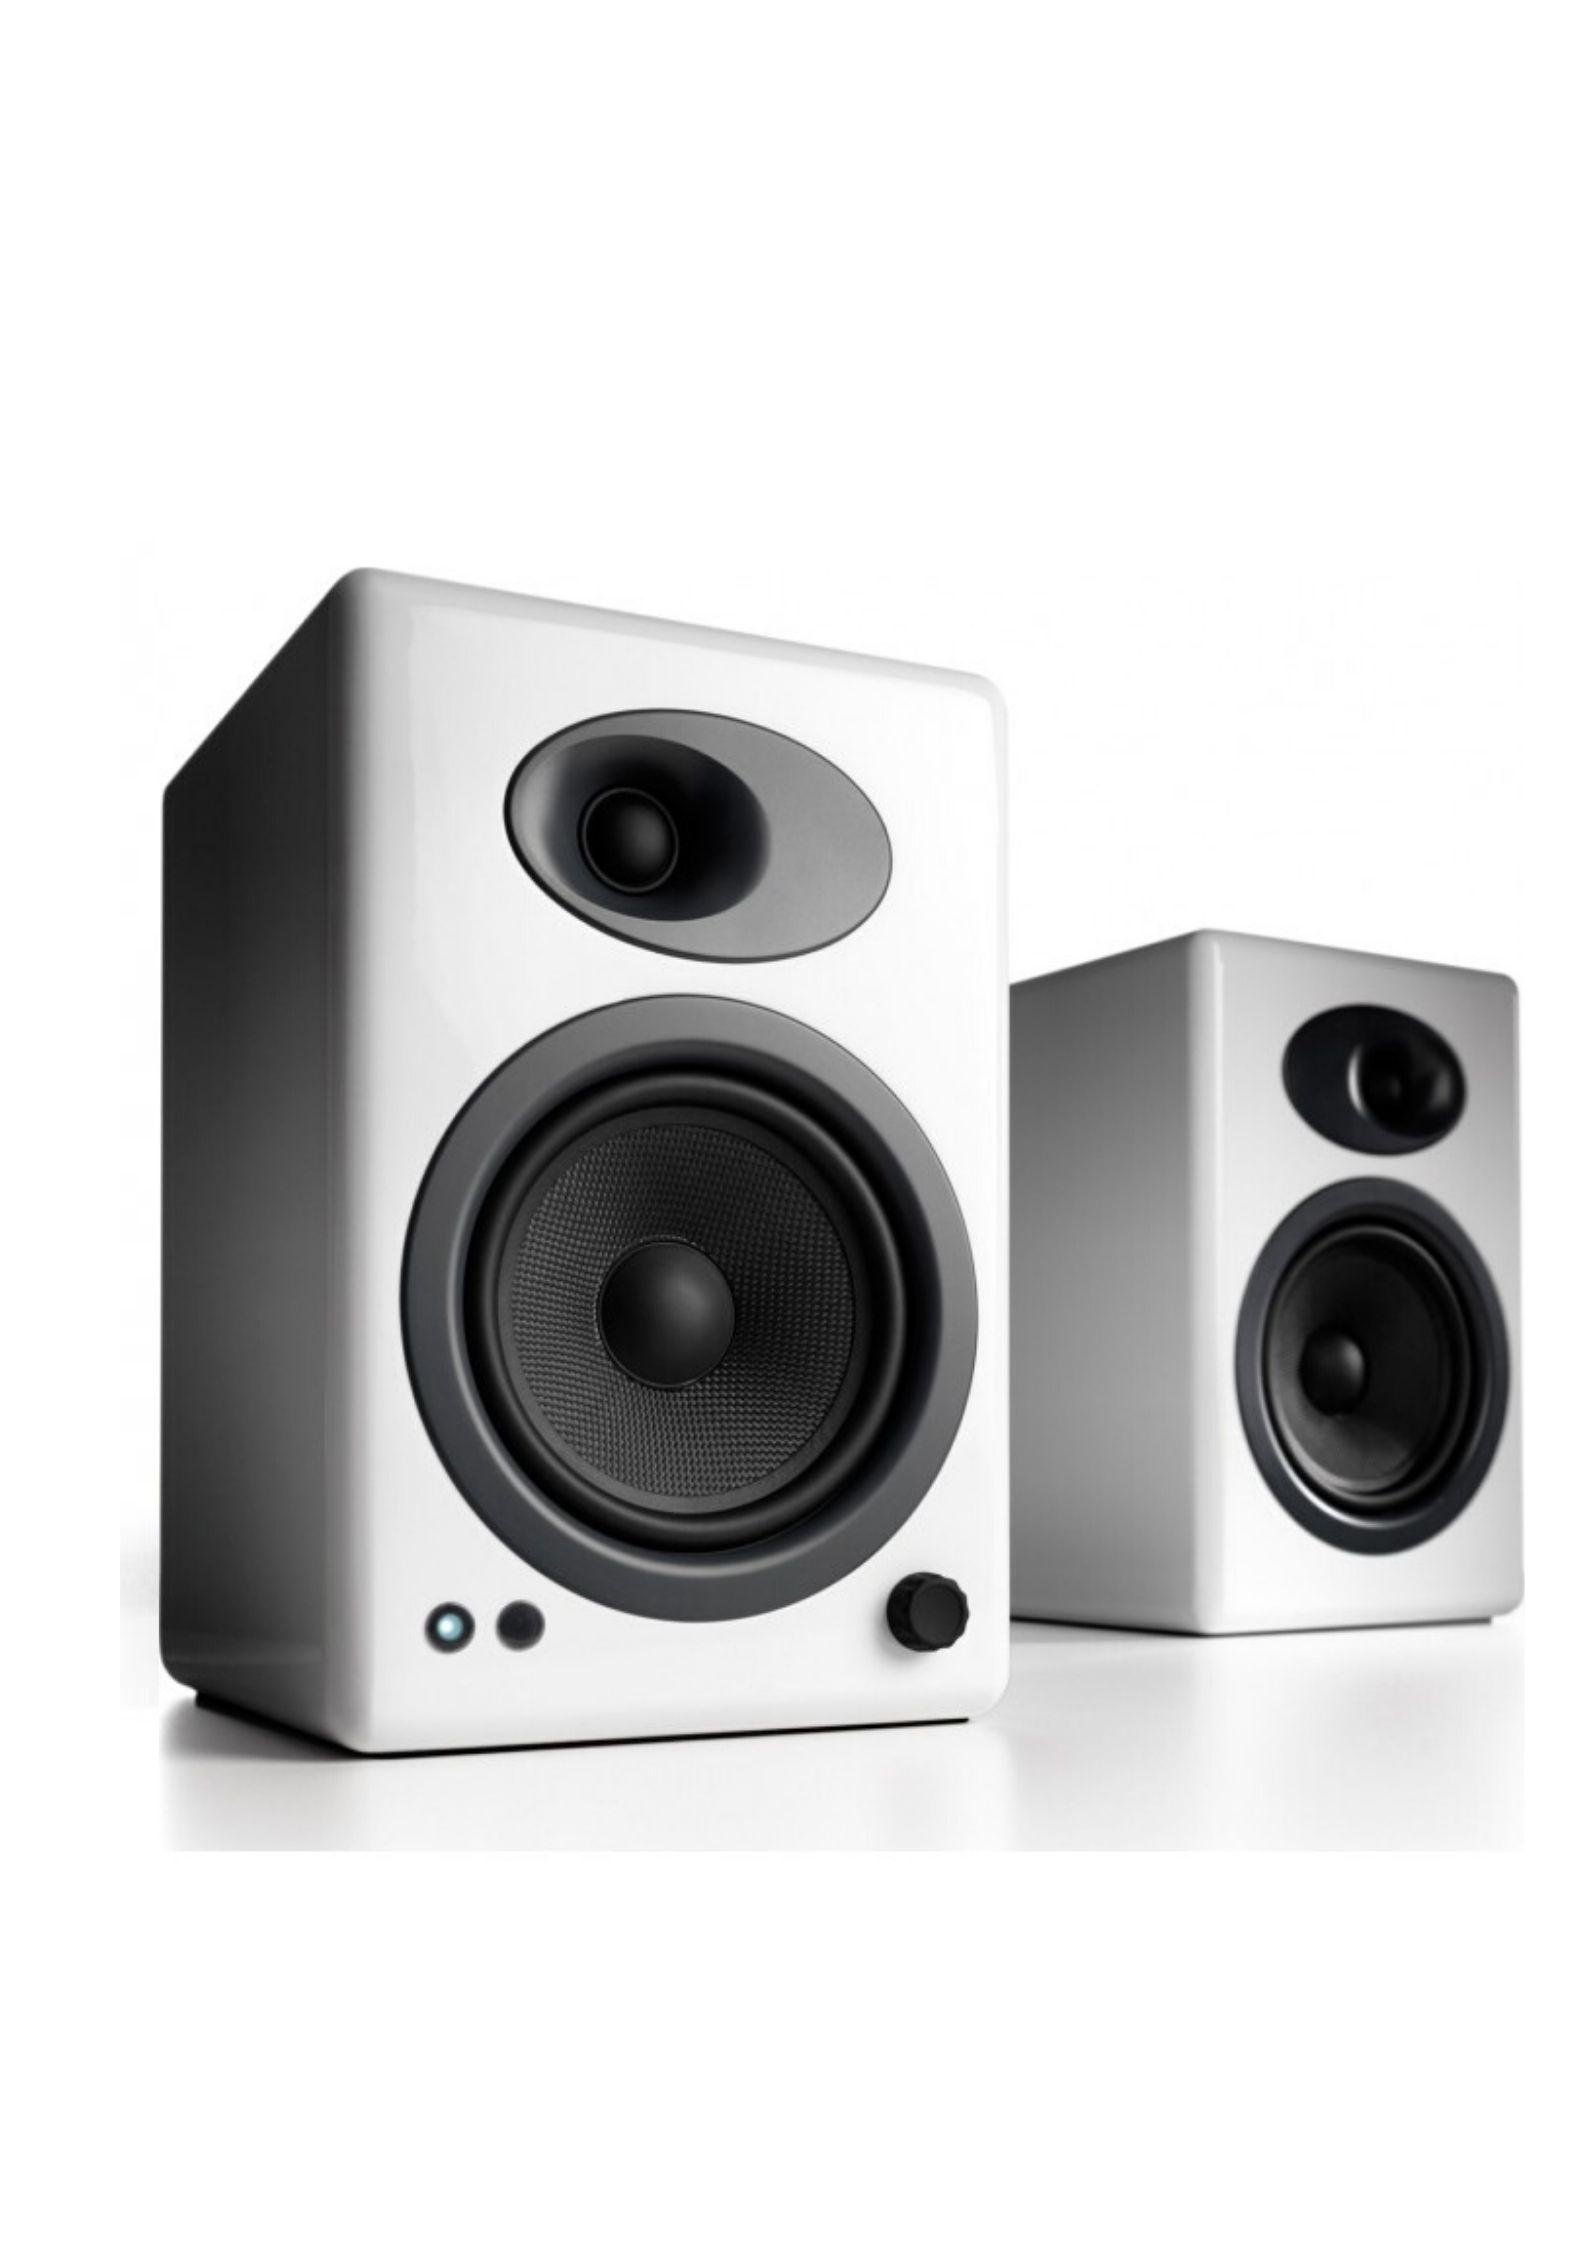 Audioengine A5+ Αυτοενισχυόμενα Ηχεία Υπολογιστή White